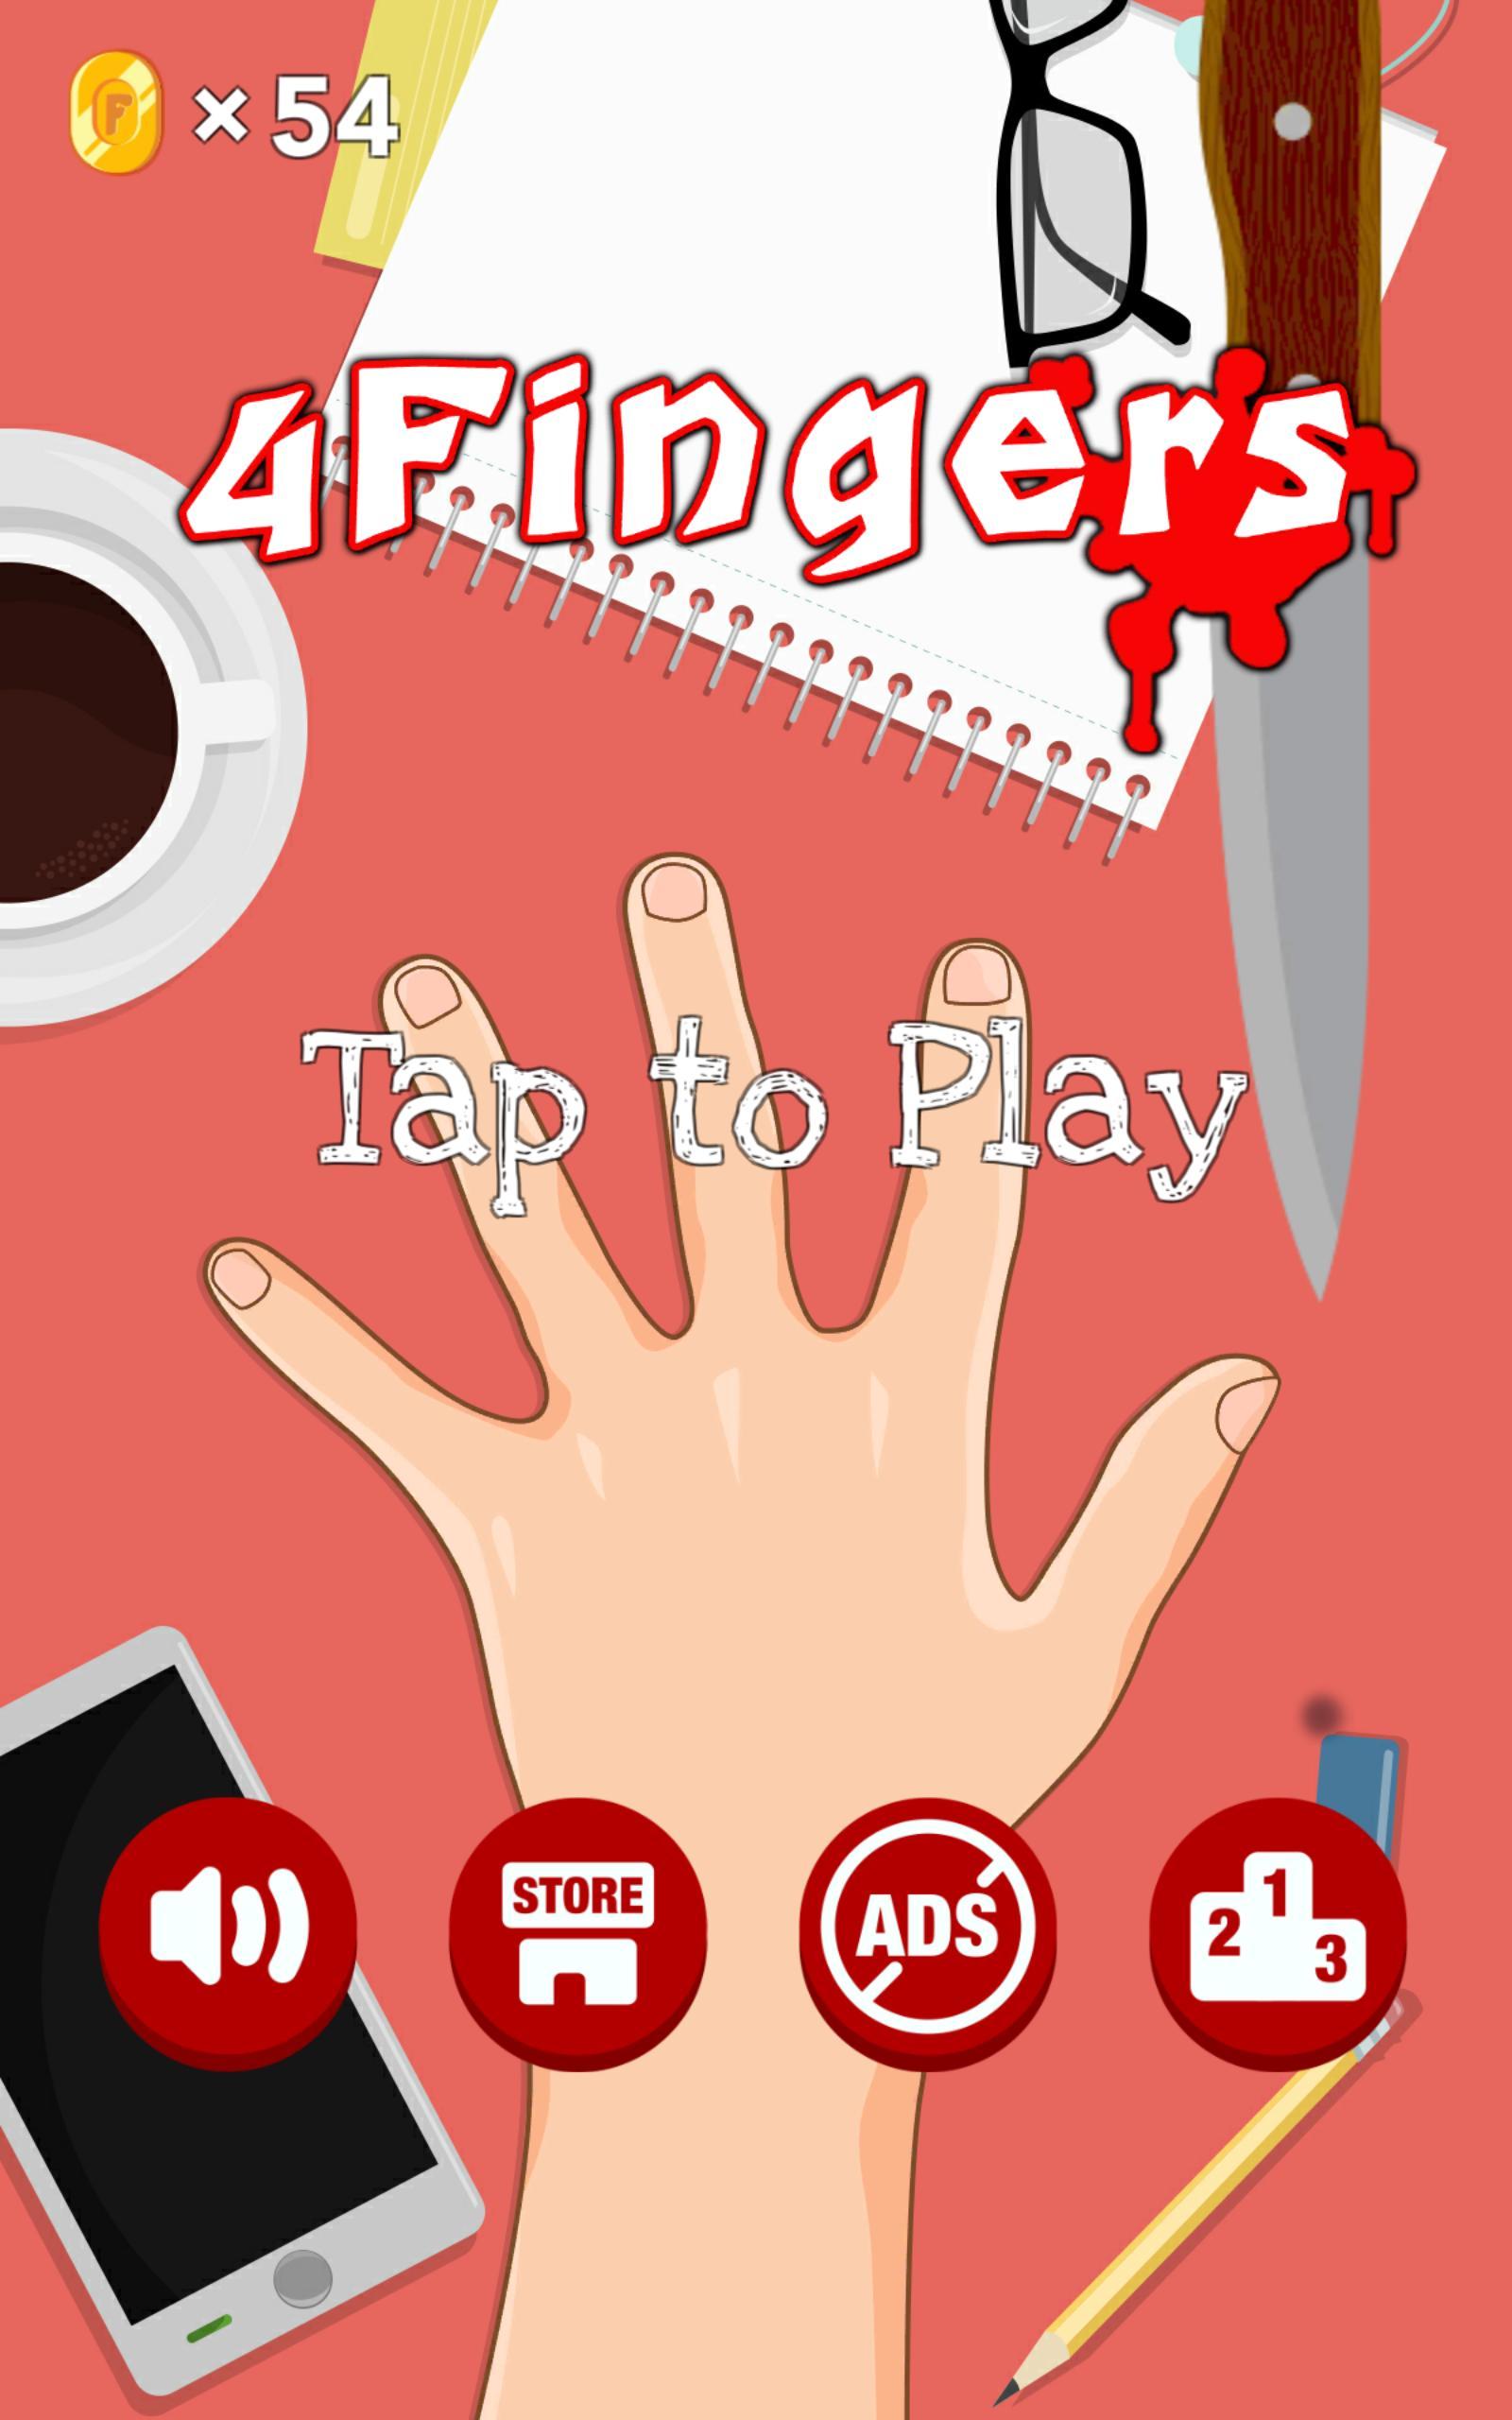 4 Fingers - free knife games 3.4 Screenshot 6